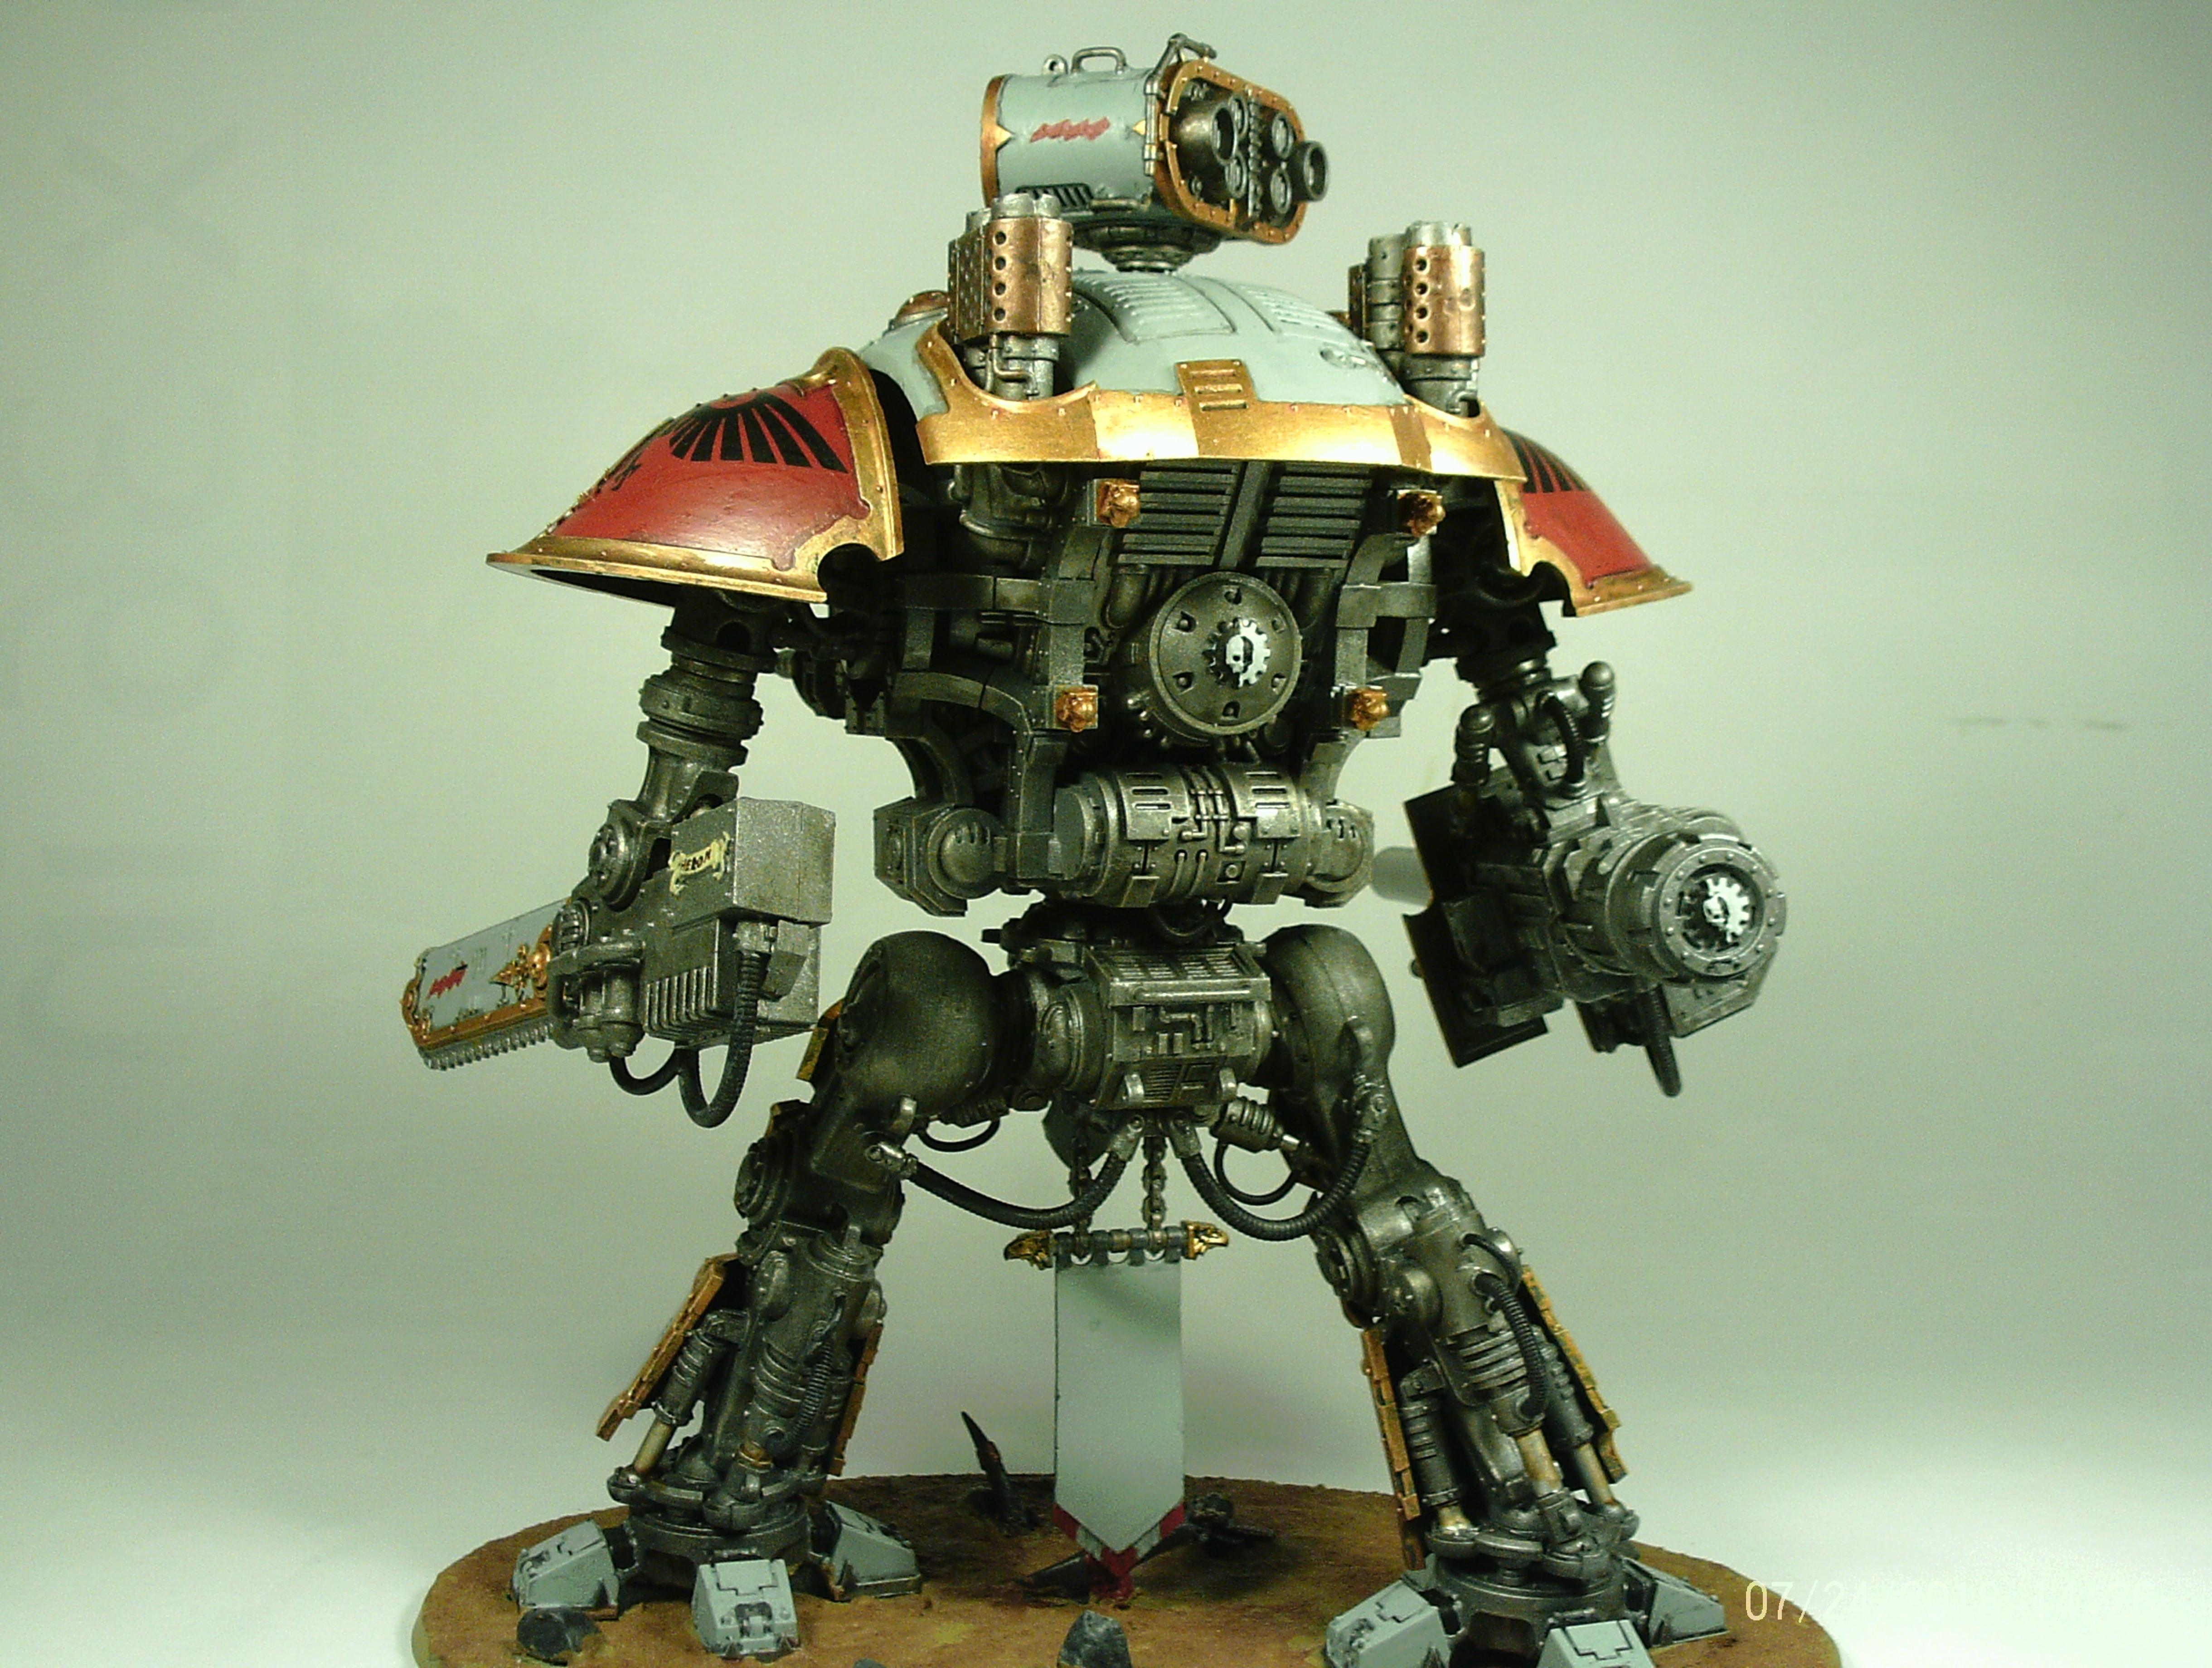 Cannon, Crusader, Errant, Gallant, Imperial, Knights, Lance, Paladin, Super-heavy, Titan, Titanic, Walker, Warden